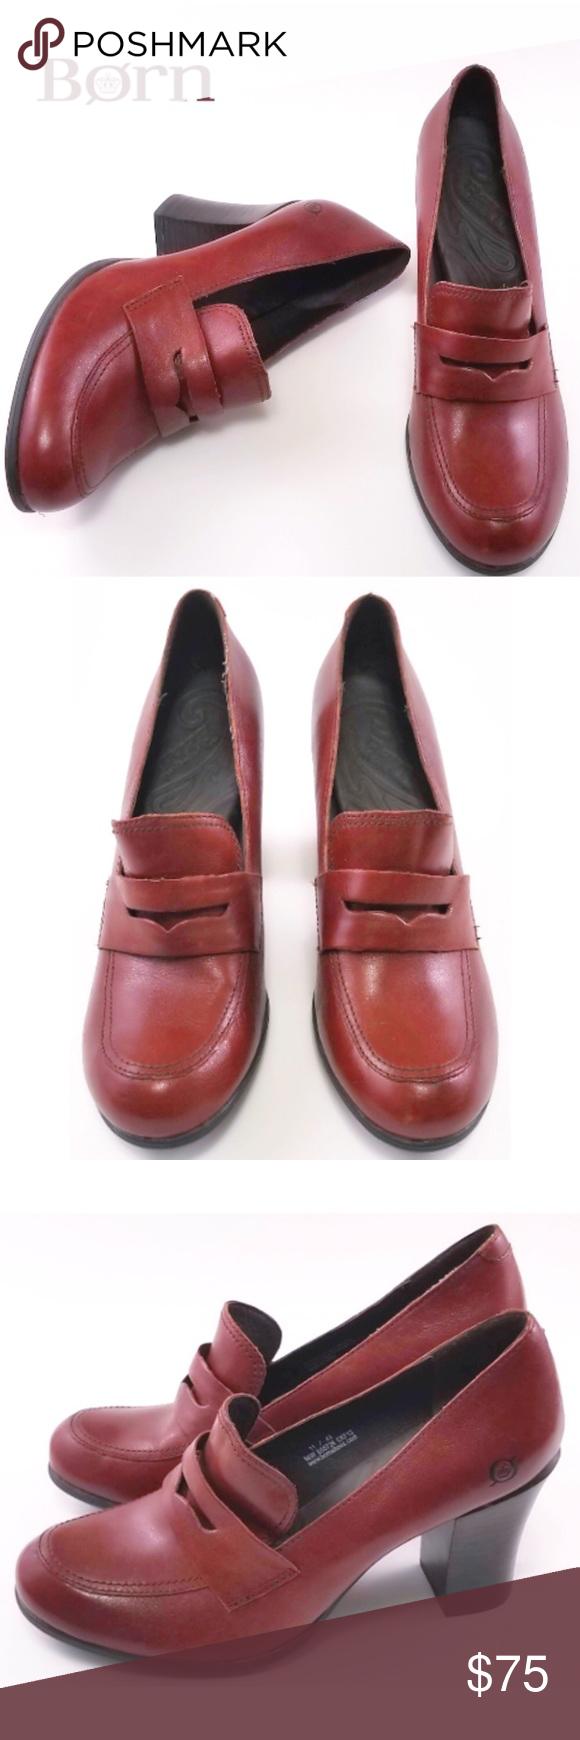 67e1e69fe2b Born Gail Block Heel Leather Penny Loafers Born Gail Block Heel Leather  Penny Loafers -Size